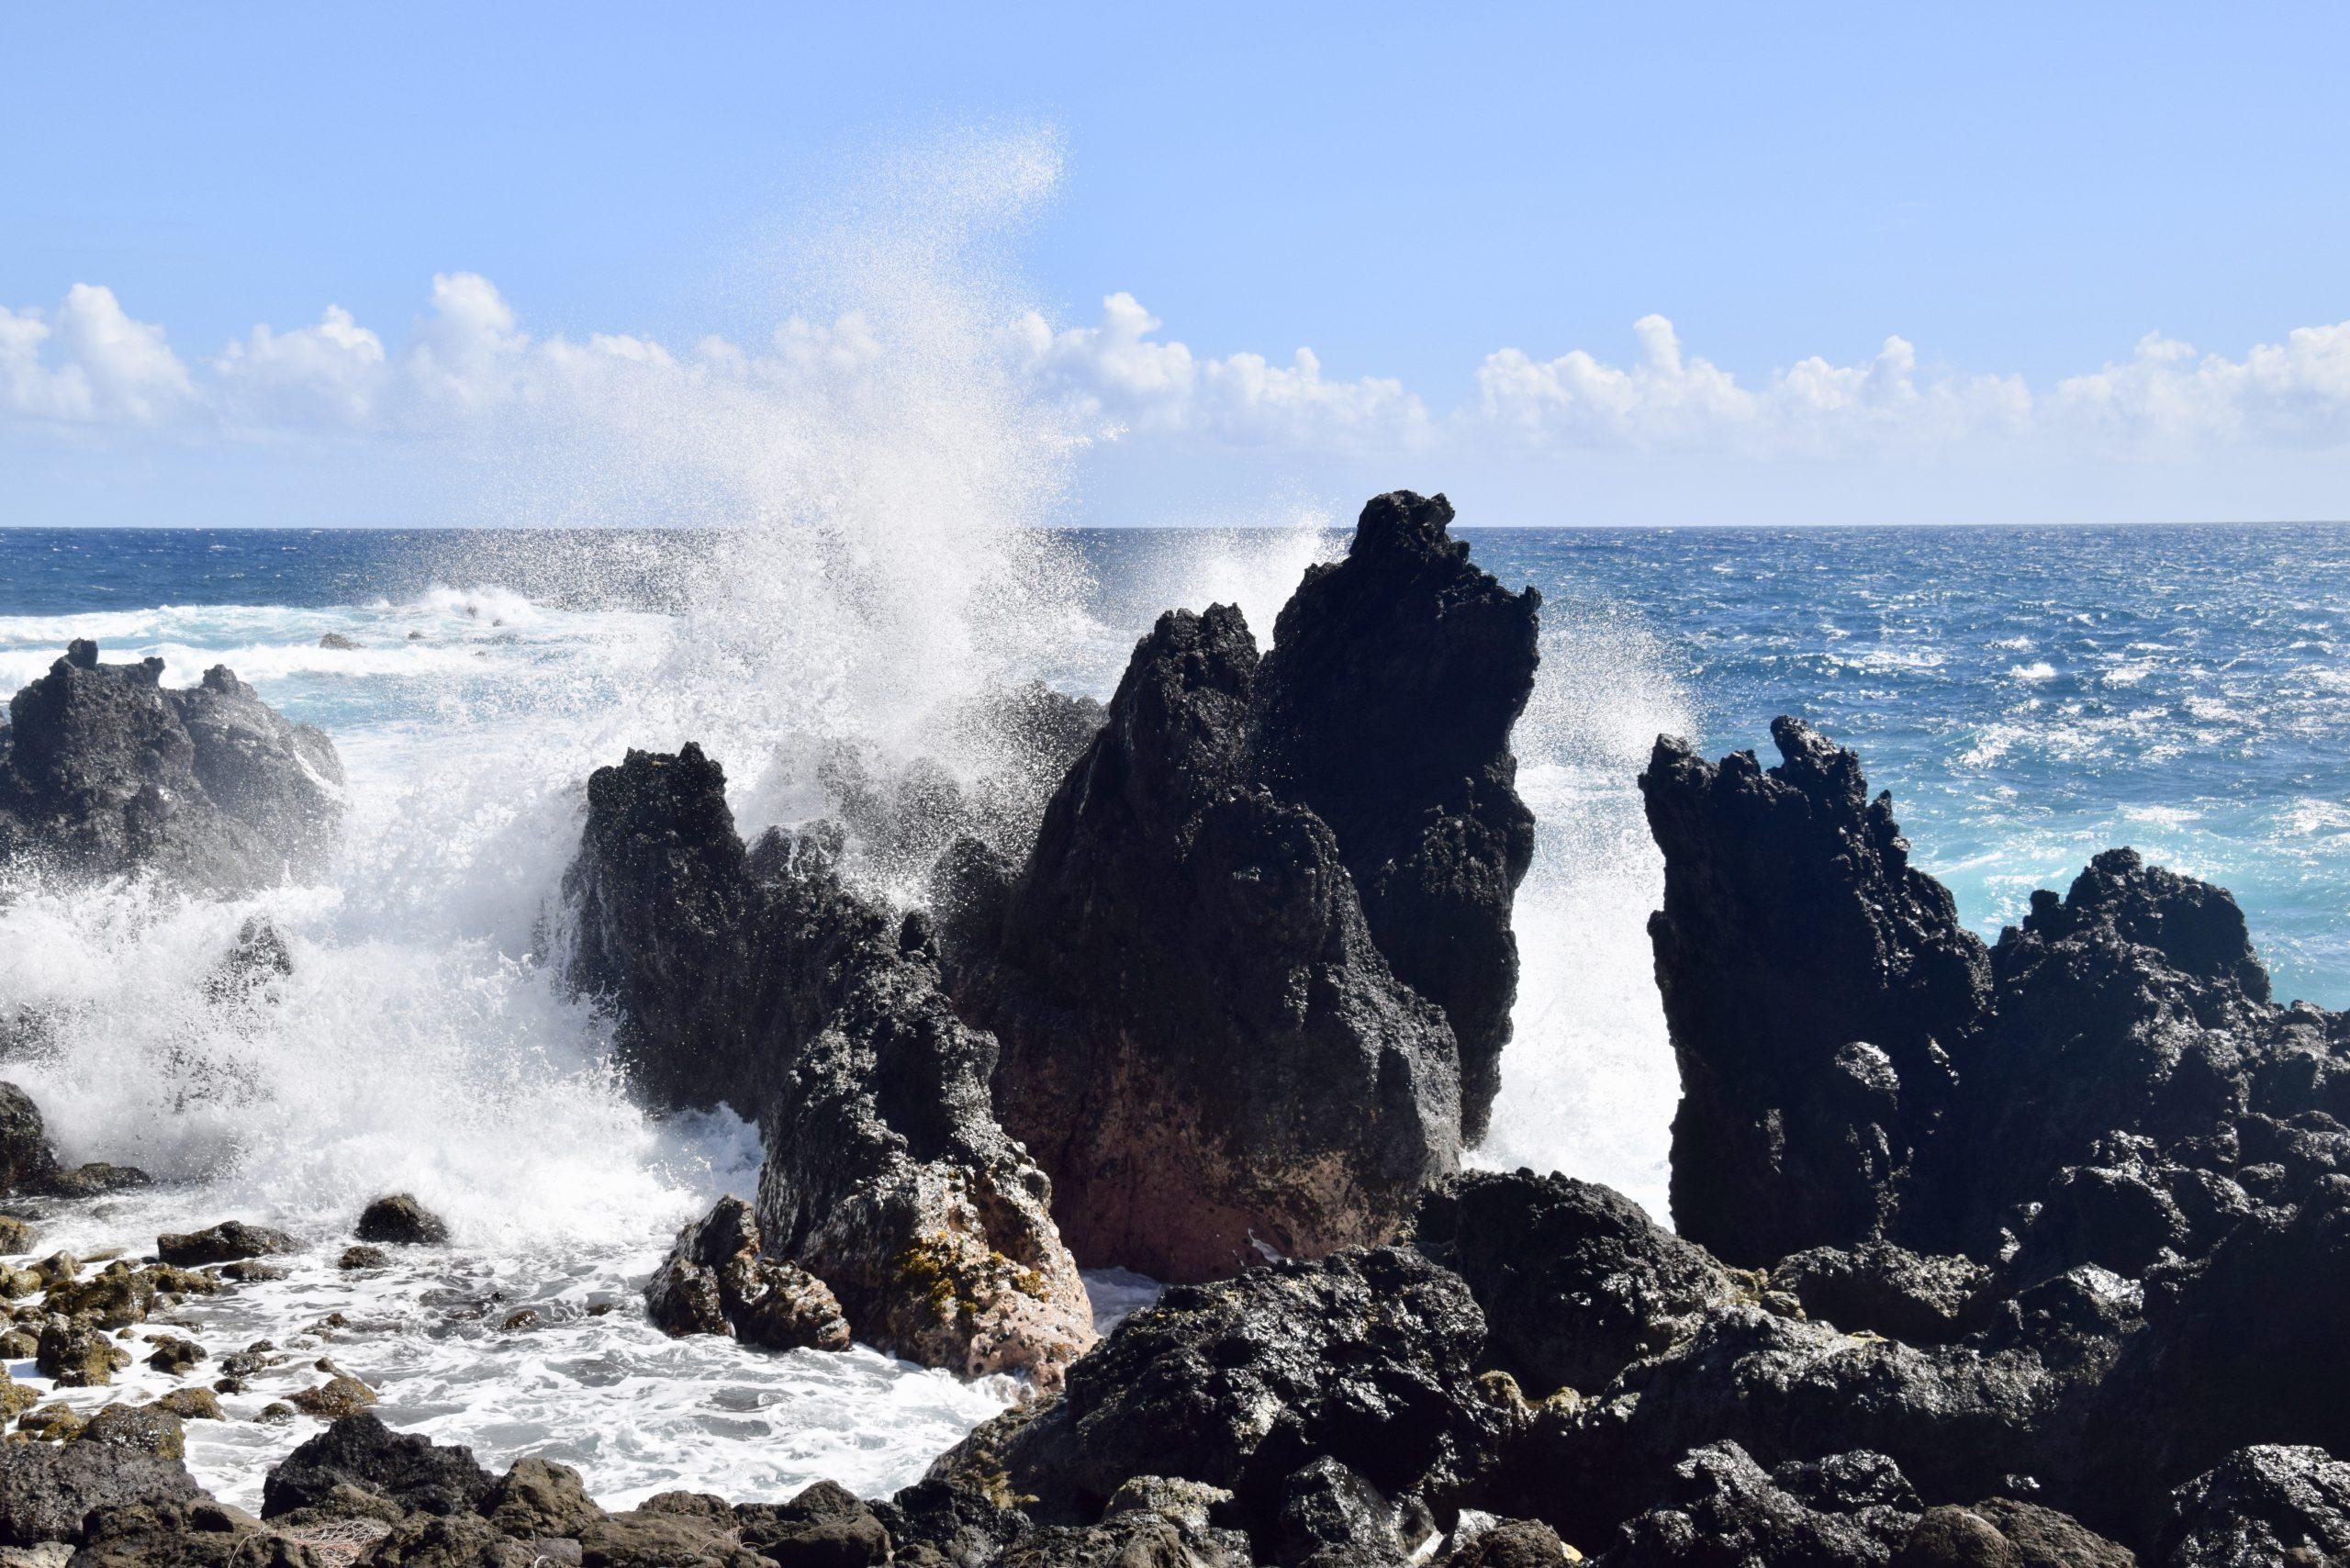 volcanic rocks form crazy surf breaks on the Island of Hawaii